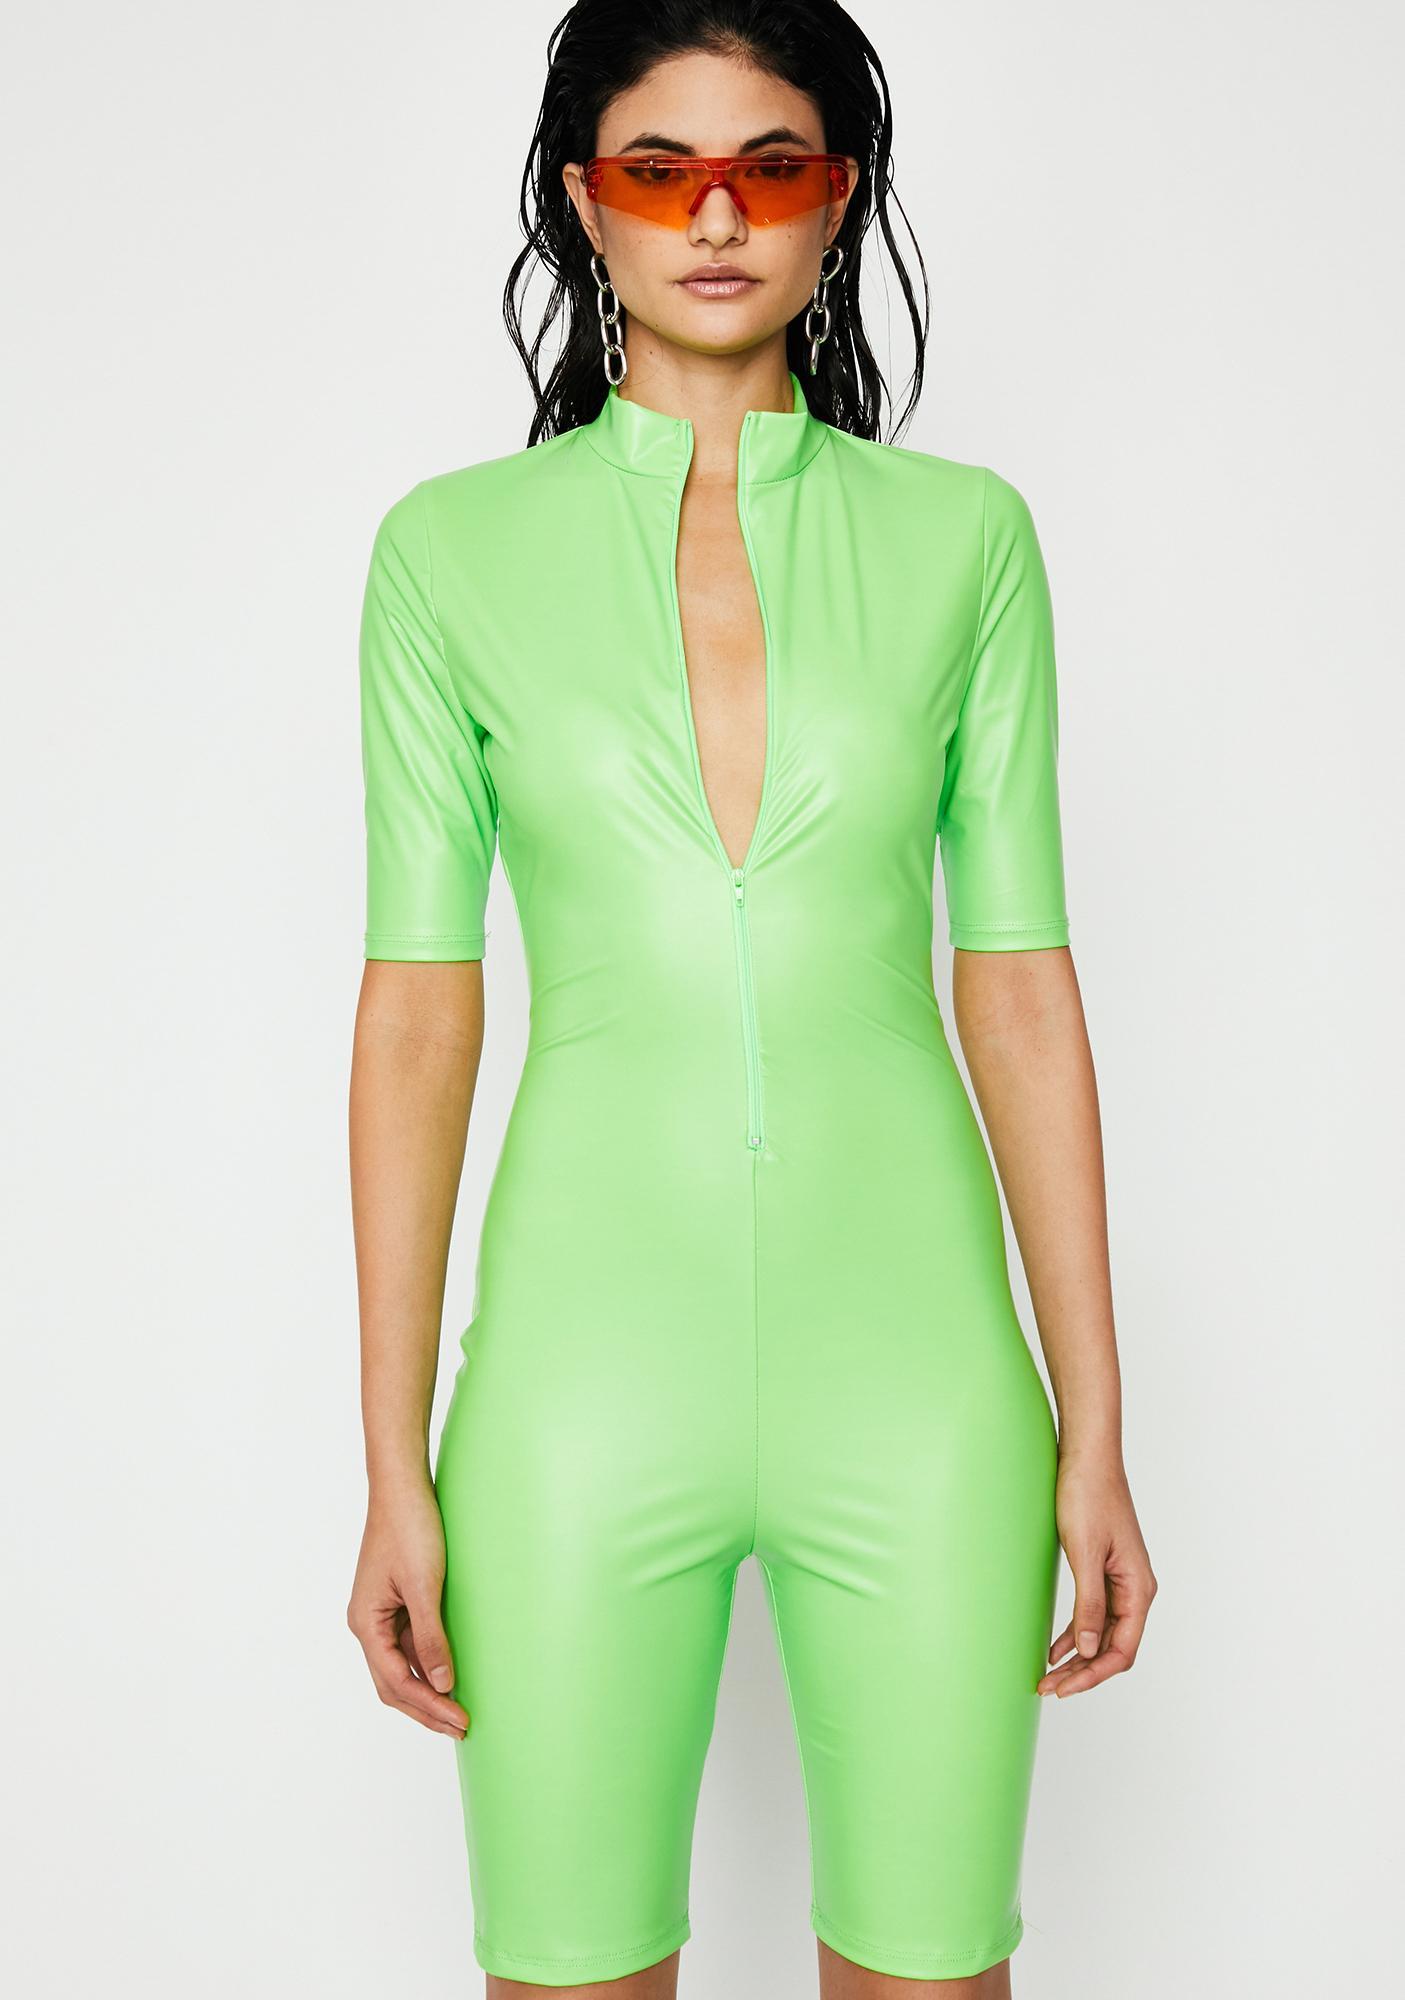 3f9ba7a5993 Nuclear Fashion Obsession Coated Romper